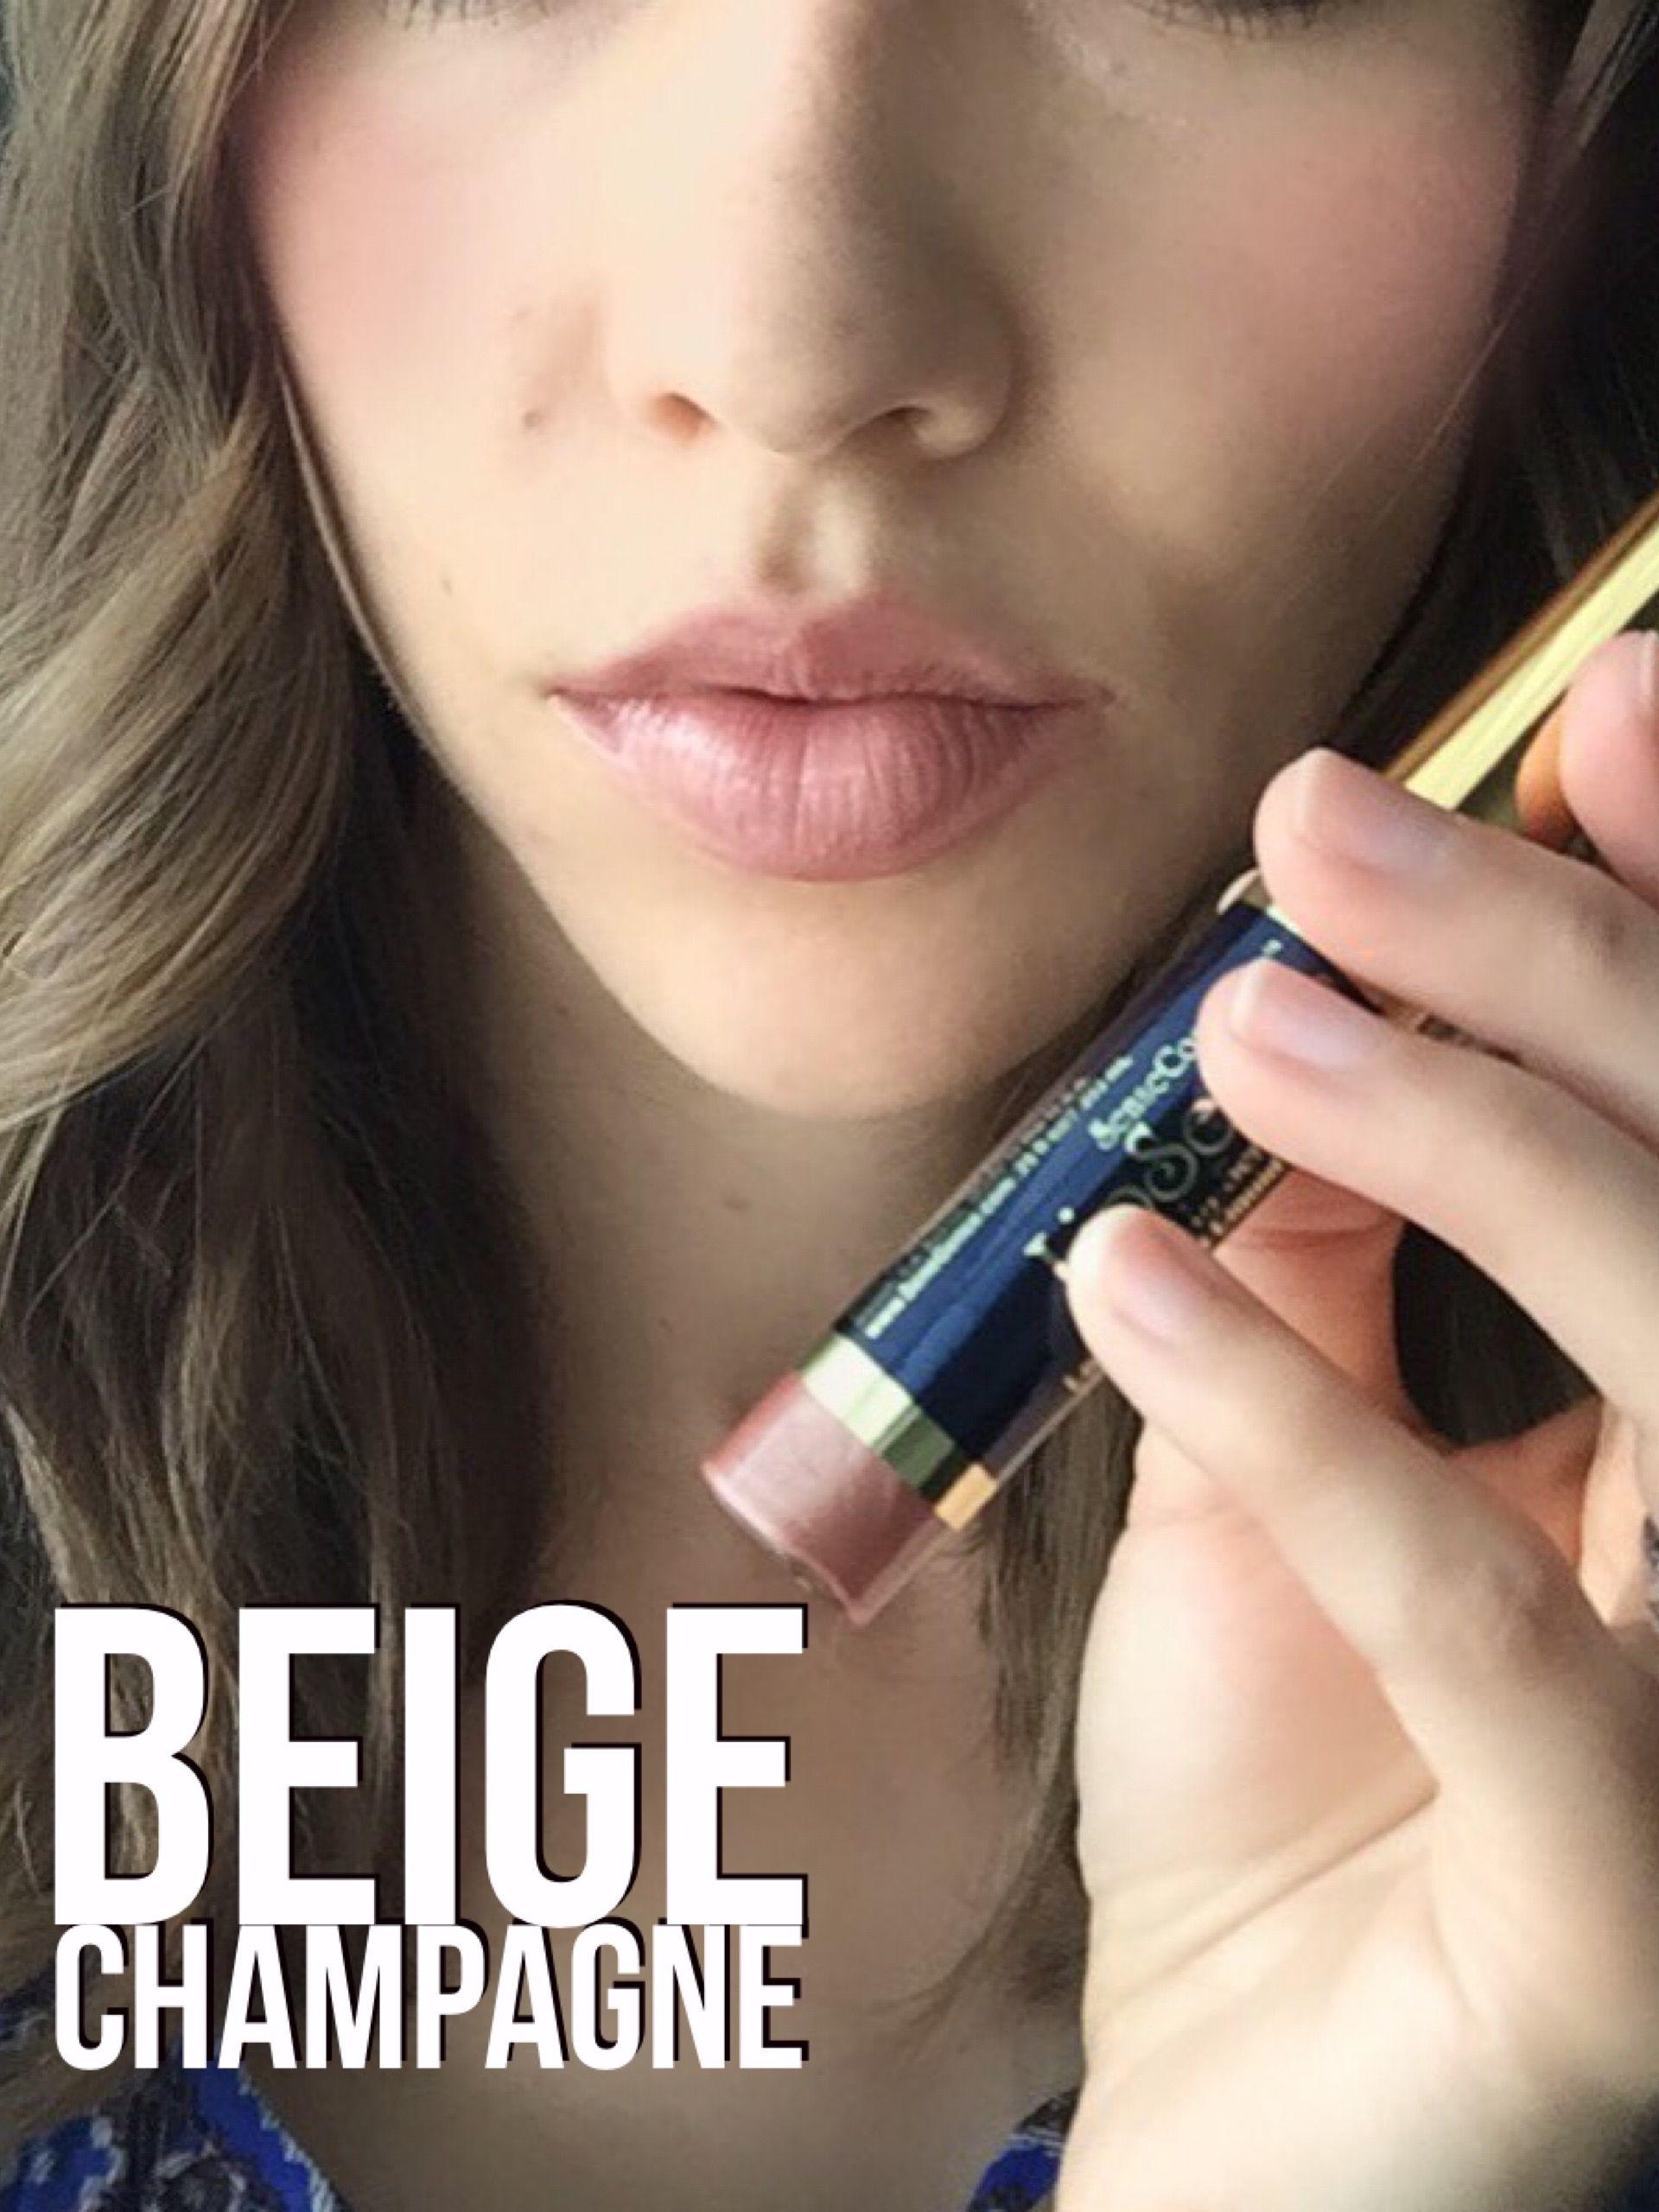 Lipsense Makeup: LipSense Beige Champagne & Glossy Gloss